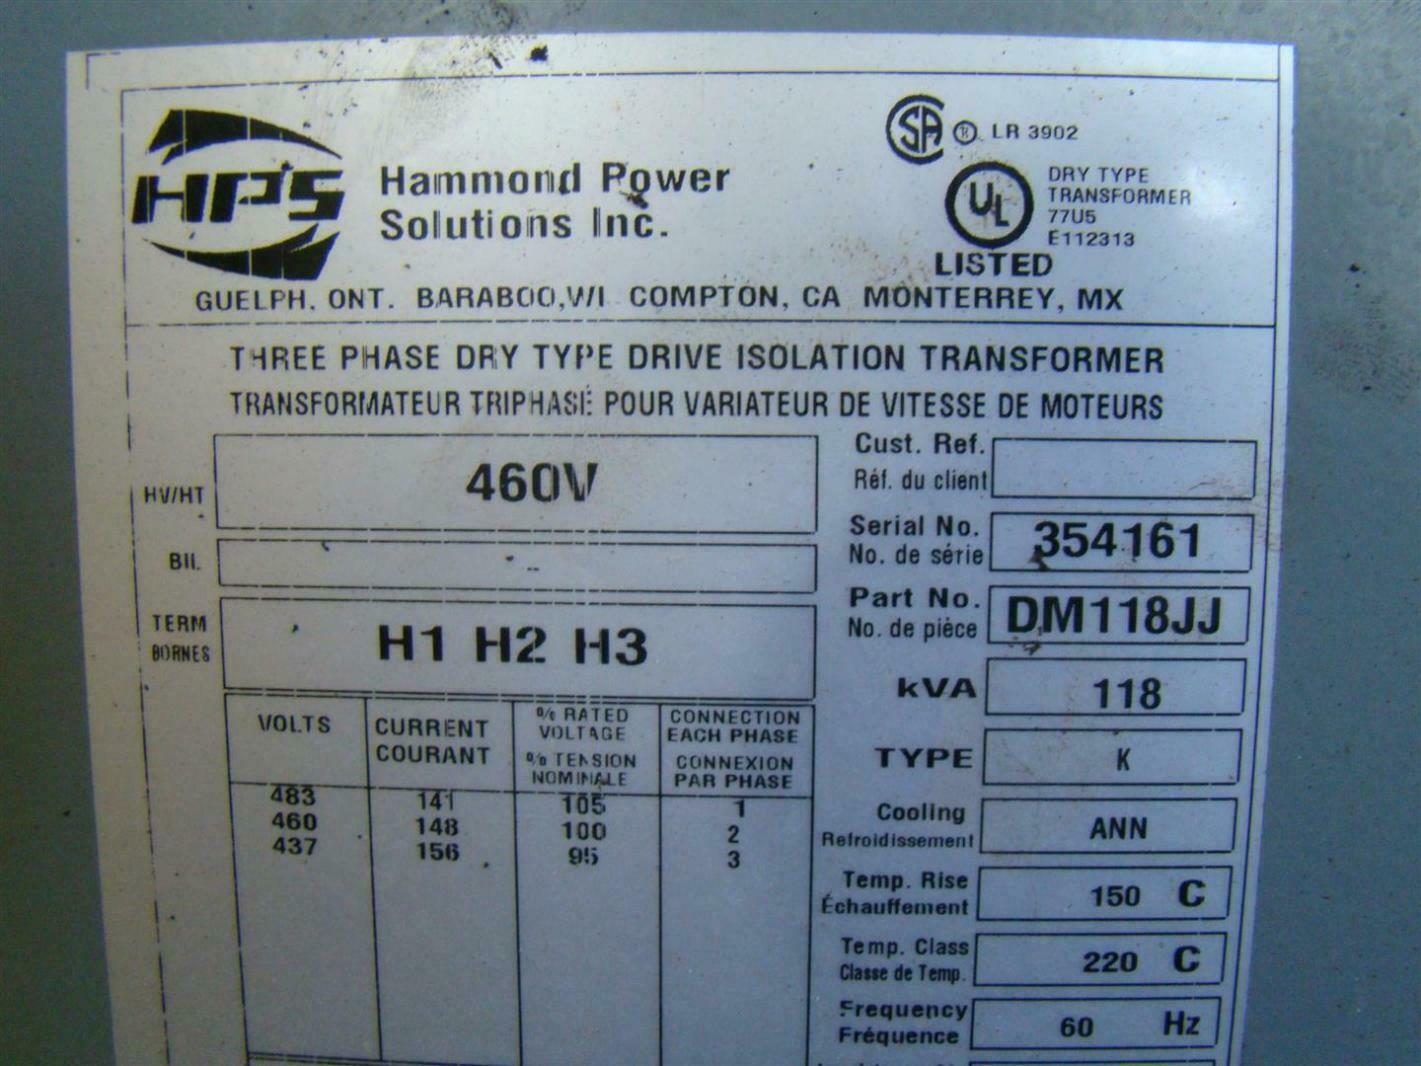 Wiring A 3 Phase Isolation Transformer Diagram Sample Hps Dry Kva 118 60 Hz 460 V Class Diagrams